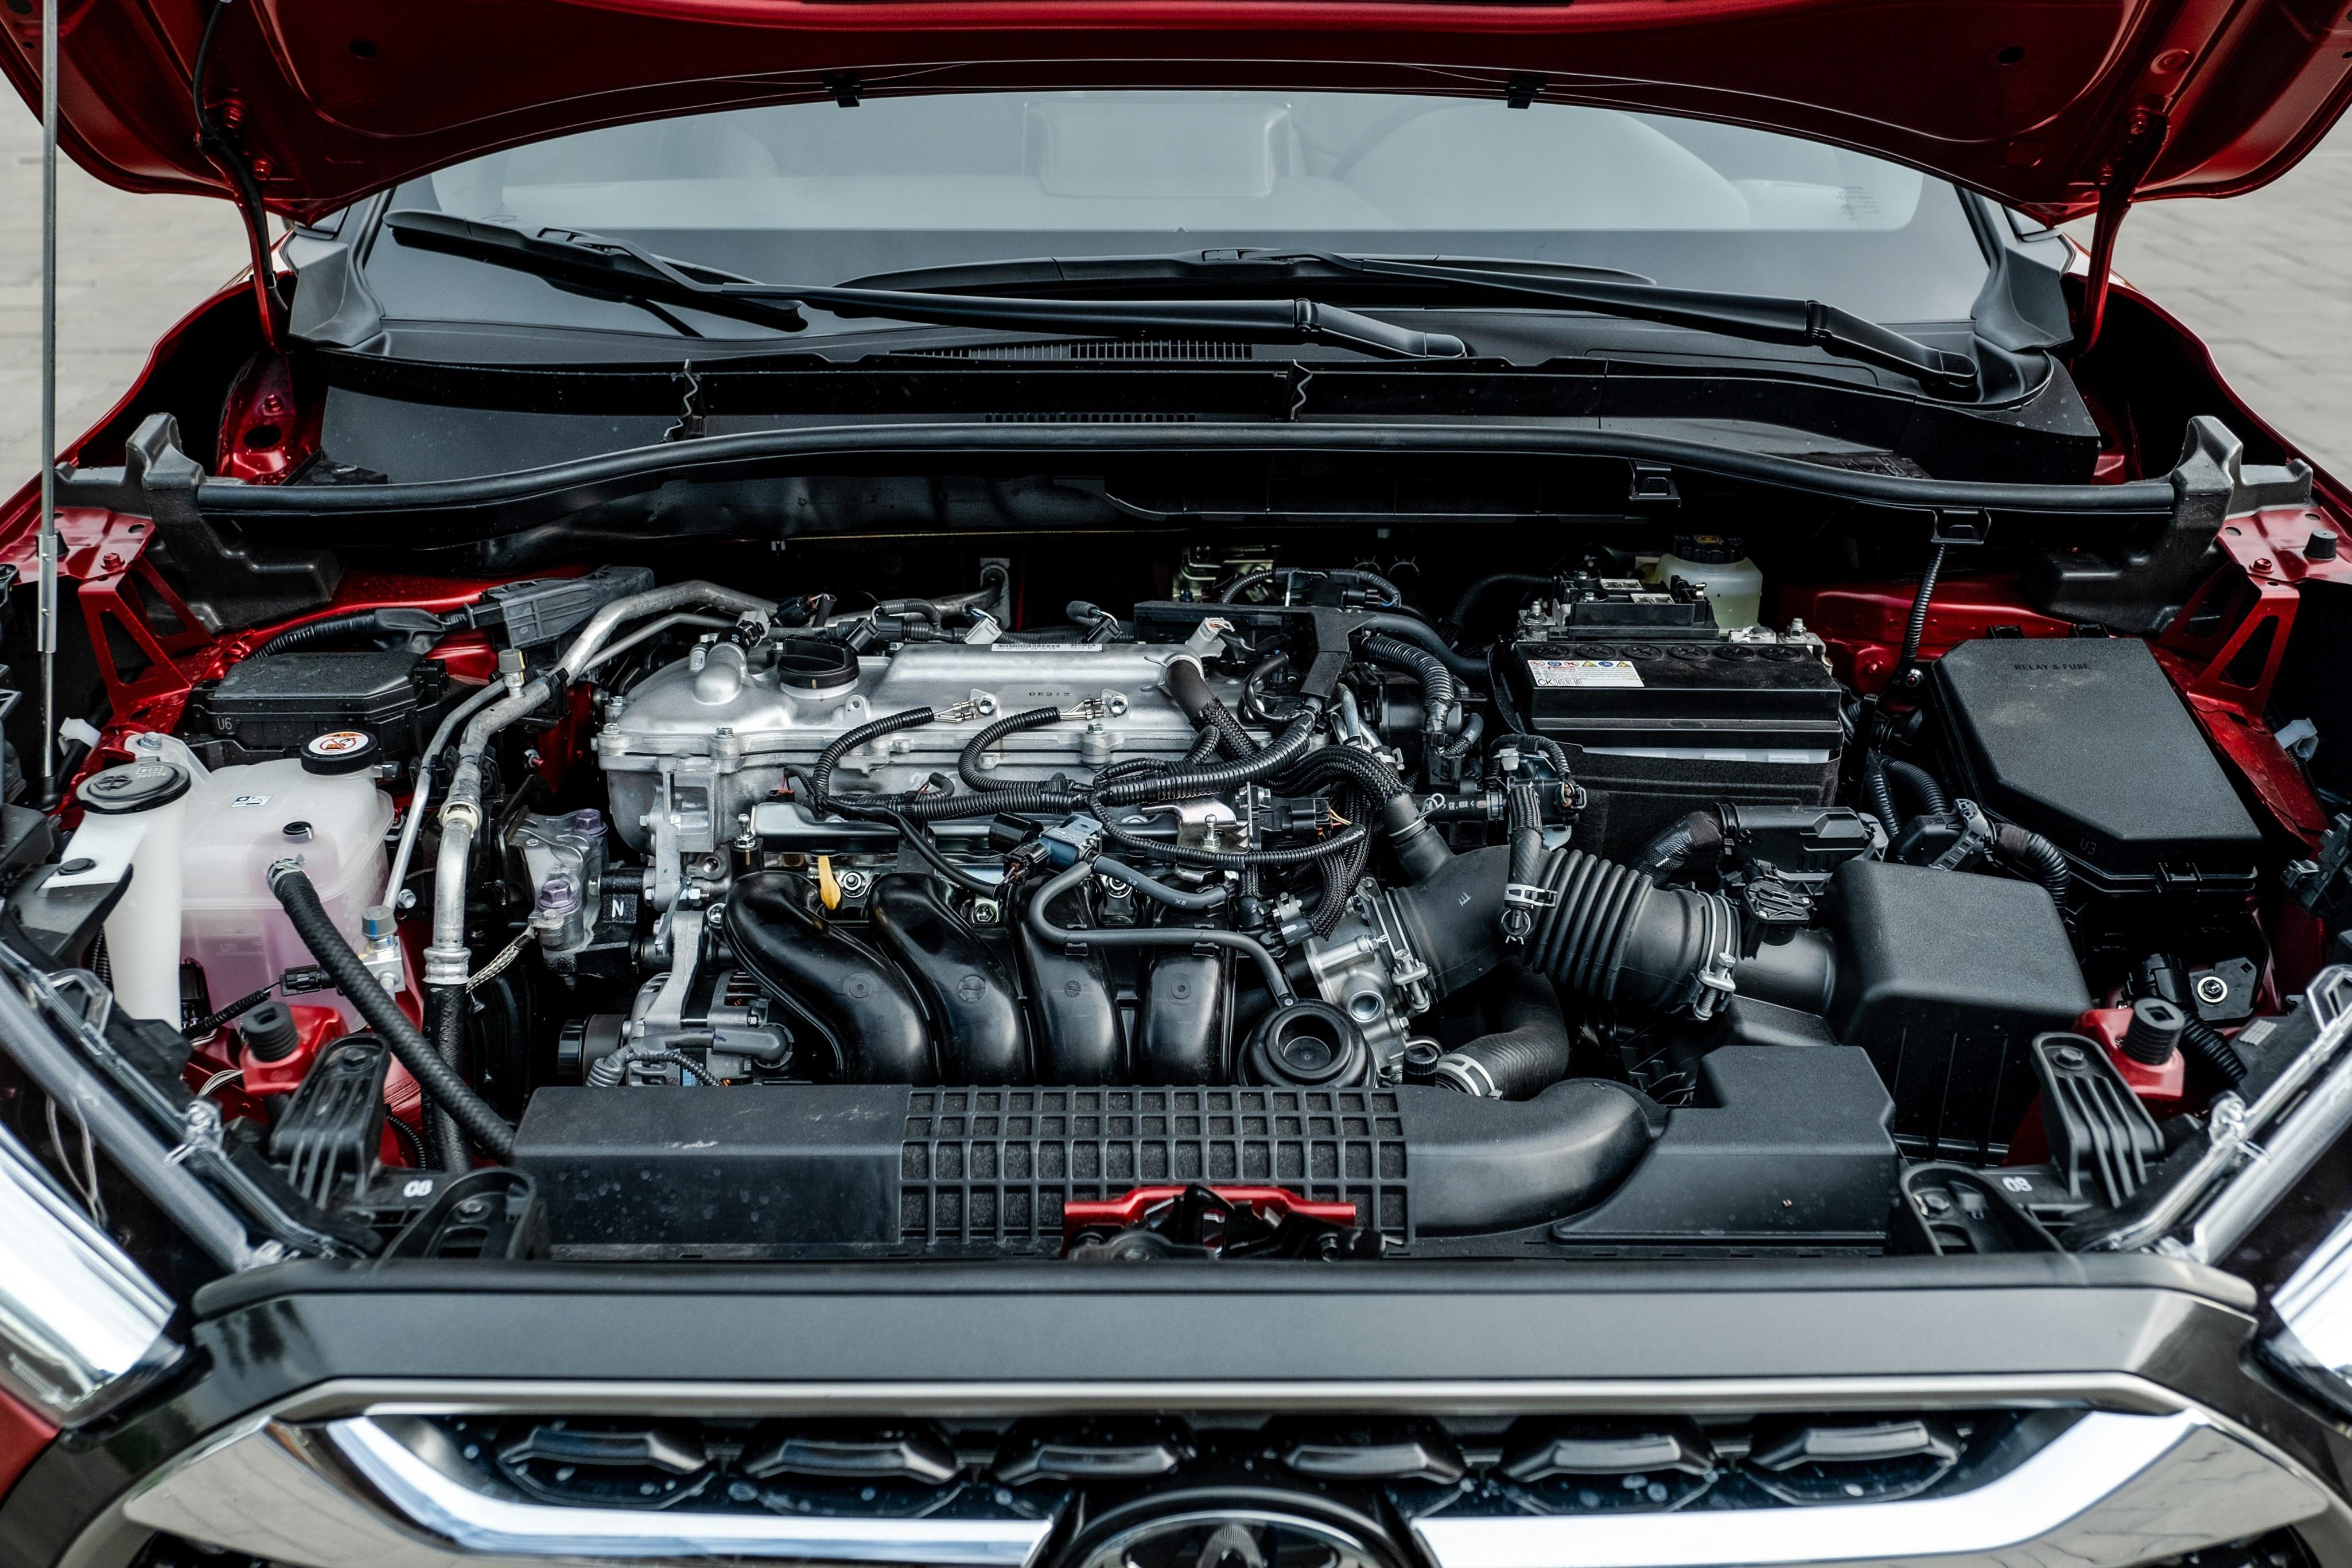 Chon Kia Seltos 1.4 Premium hay Toyota Corolla Cross 1.8V? anh 17